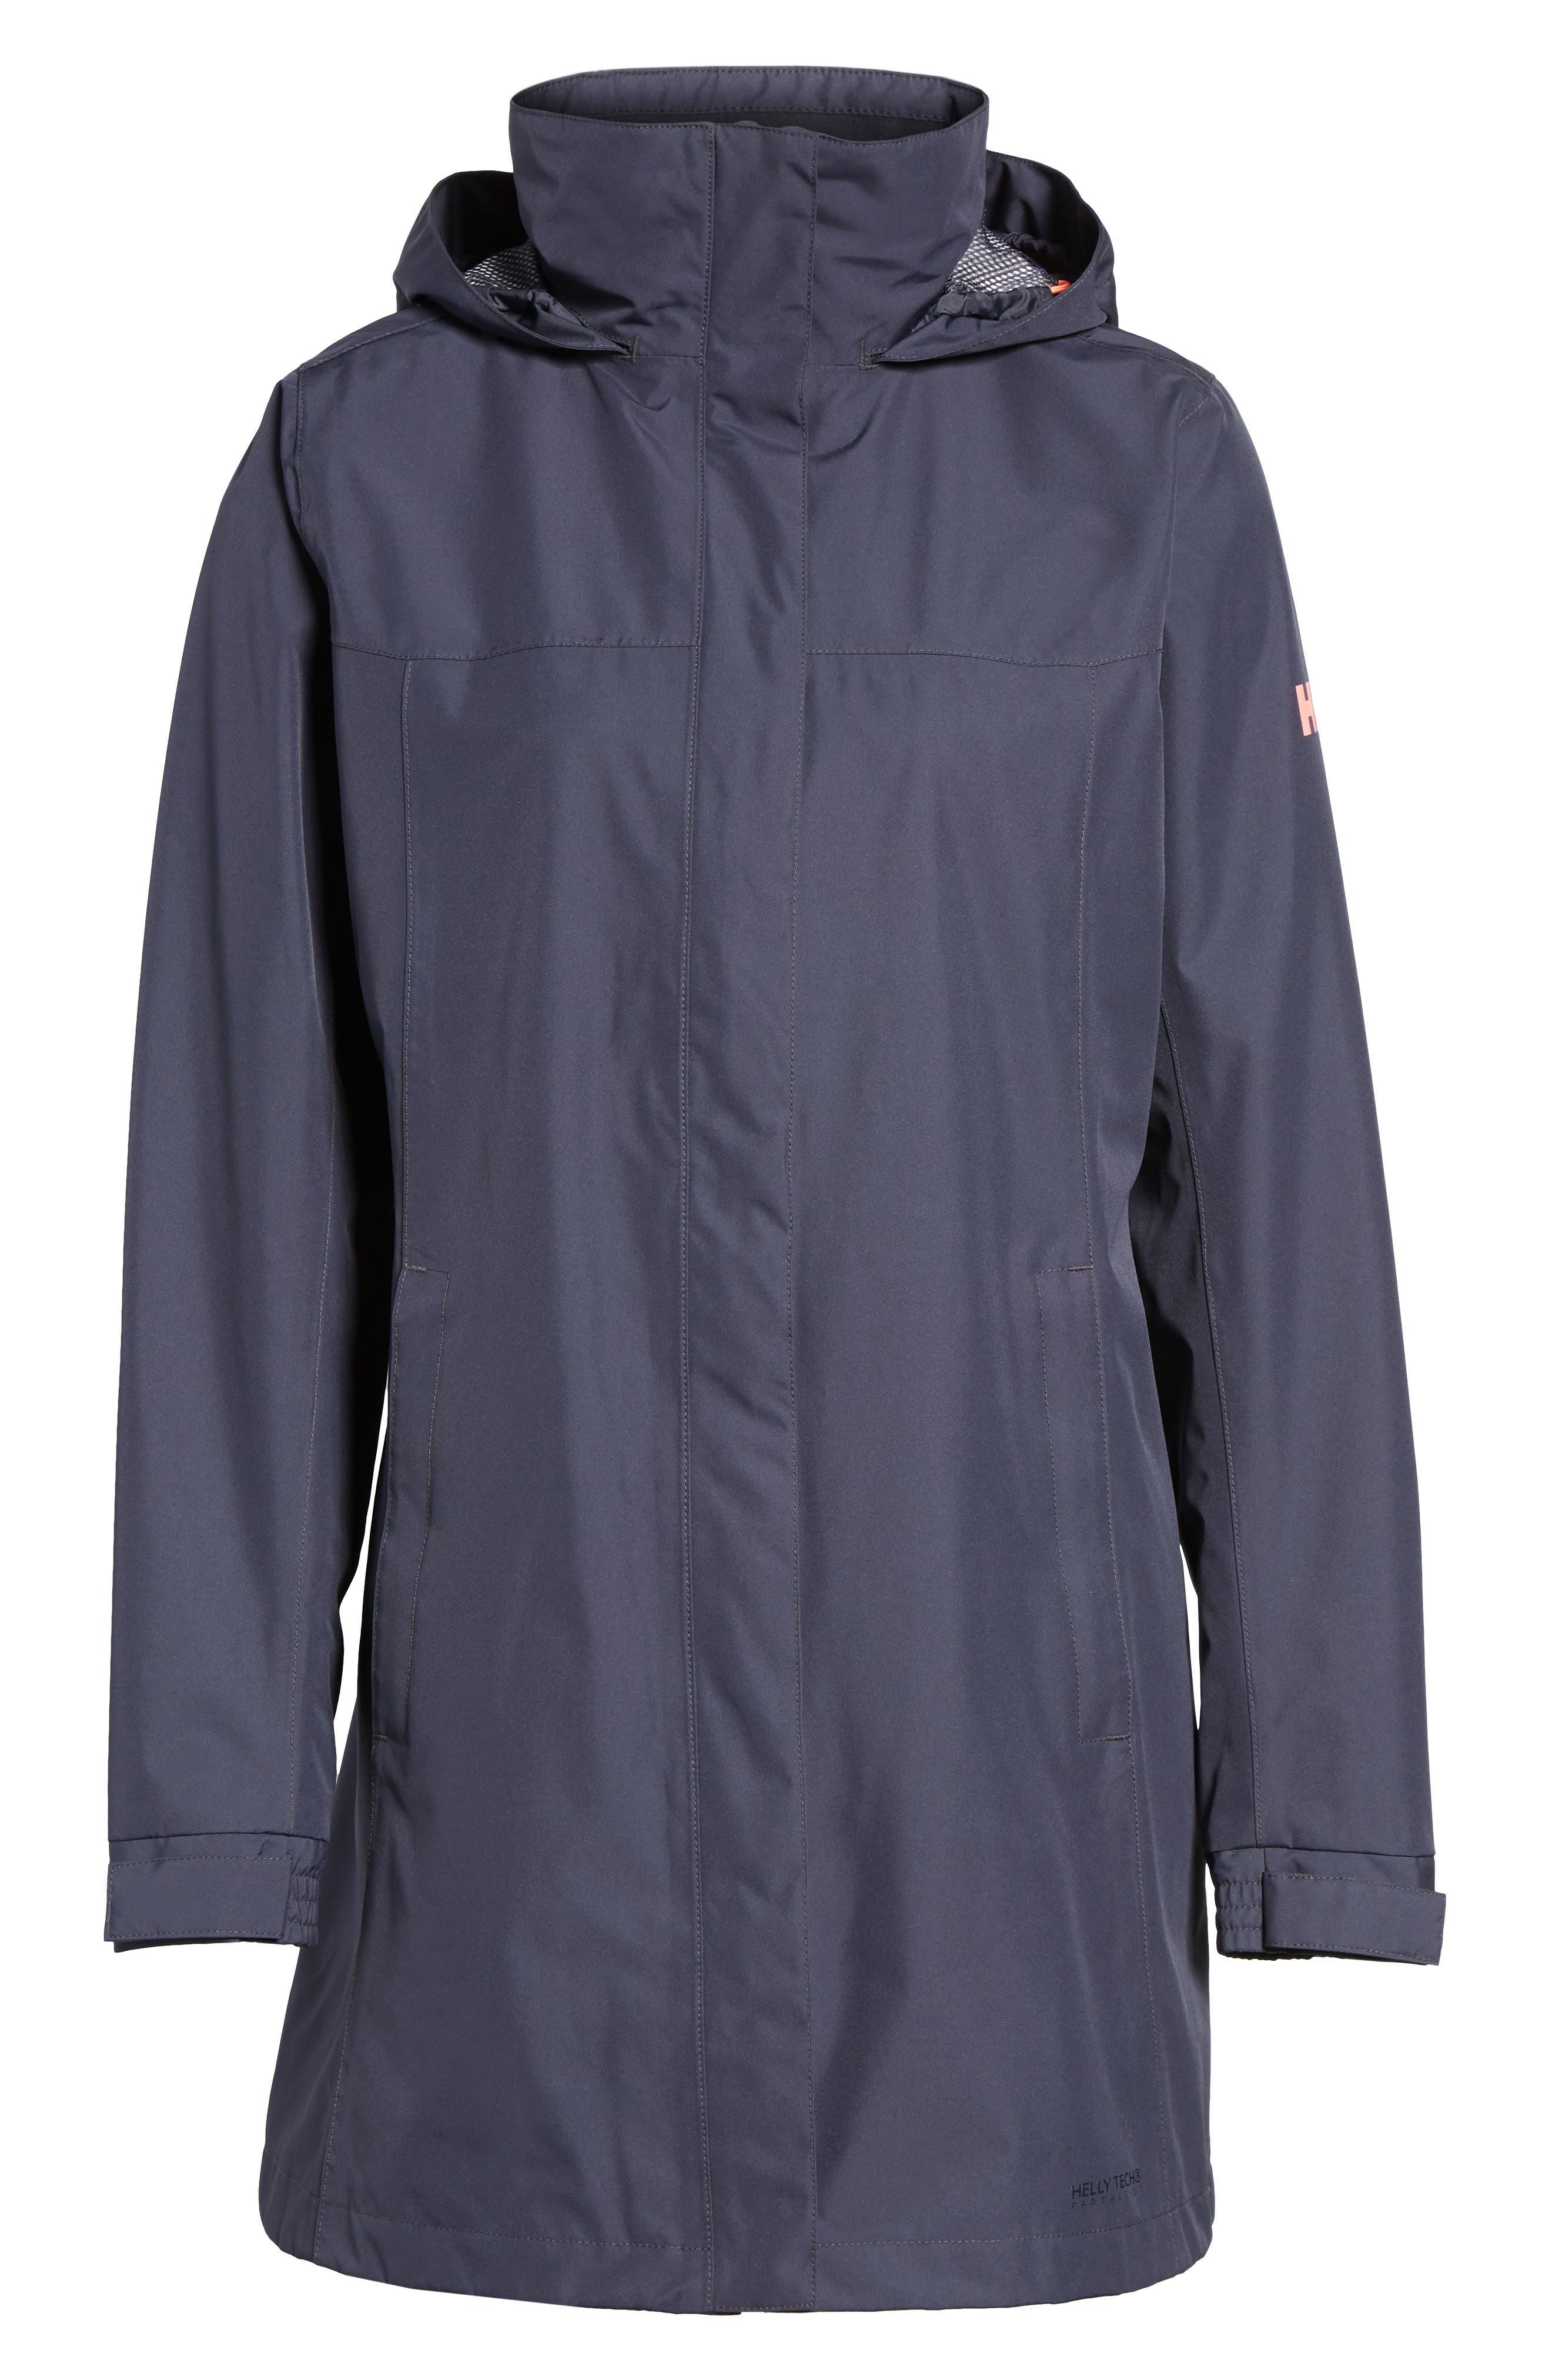 'Aden' Helly Tech<sup>®</sup> Raincoat,                             Alternate thumbnail 6, color,                             409